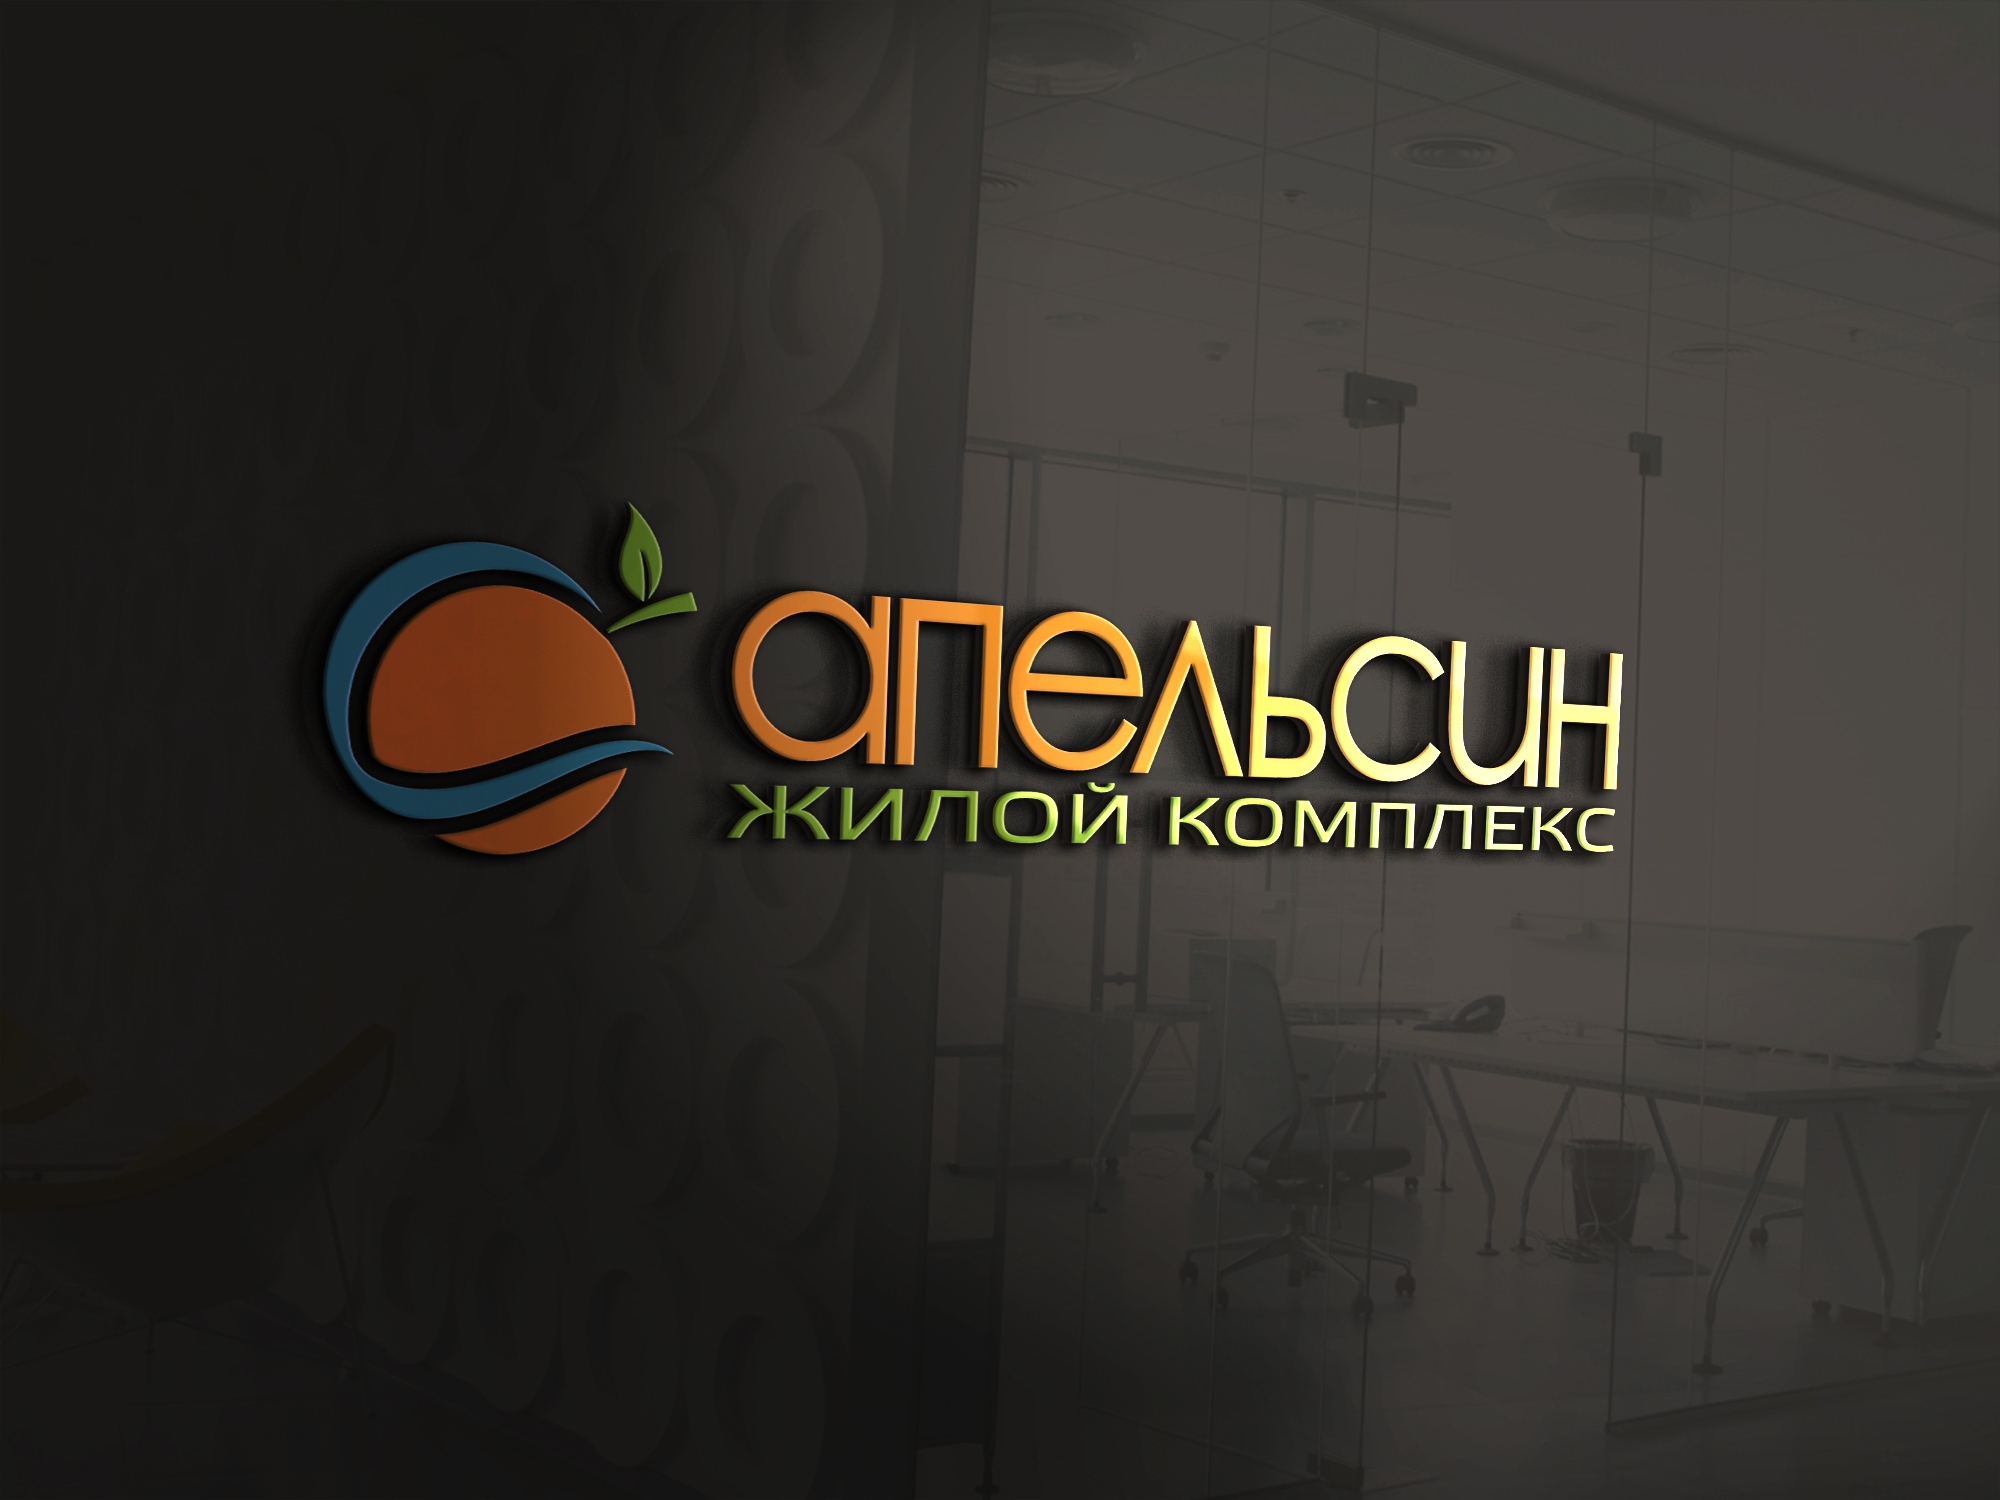 Логотип и фирменный стиль фото f_0415a587478c194b.jpg